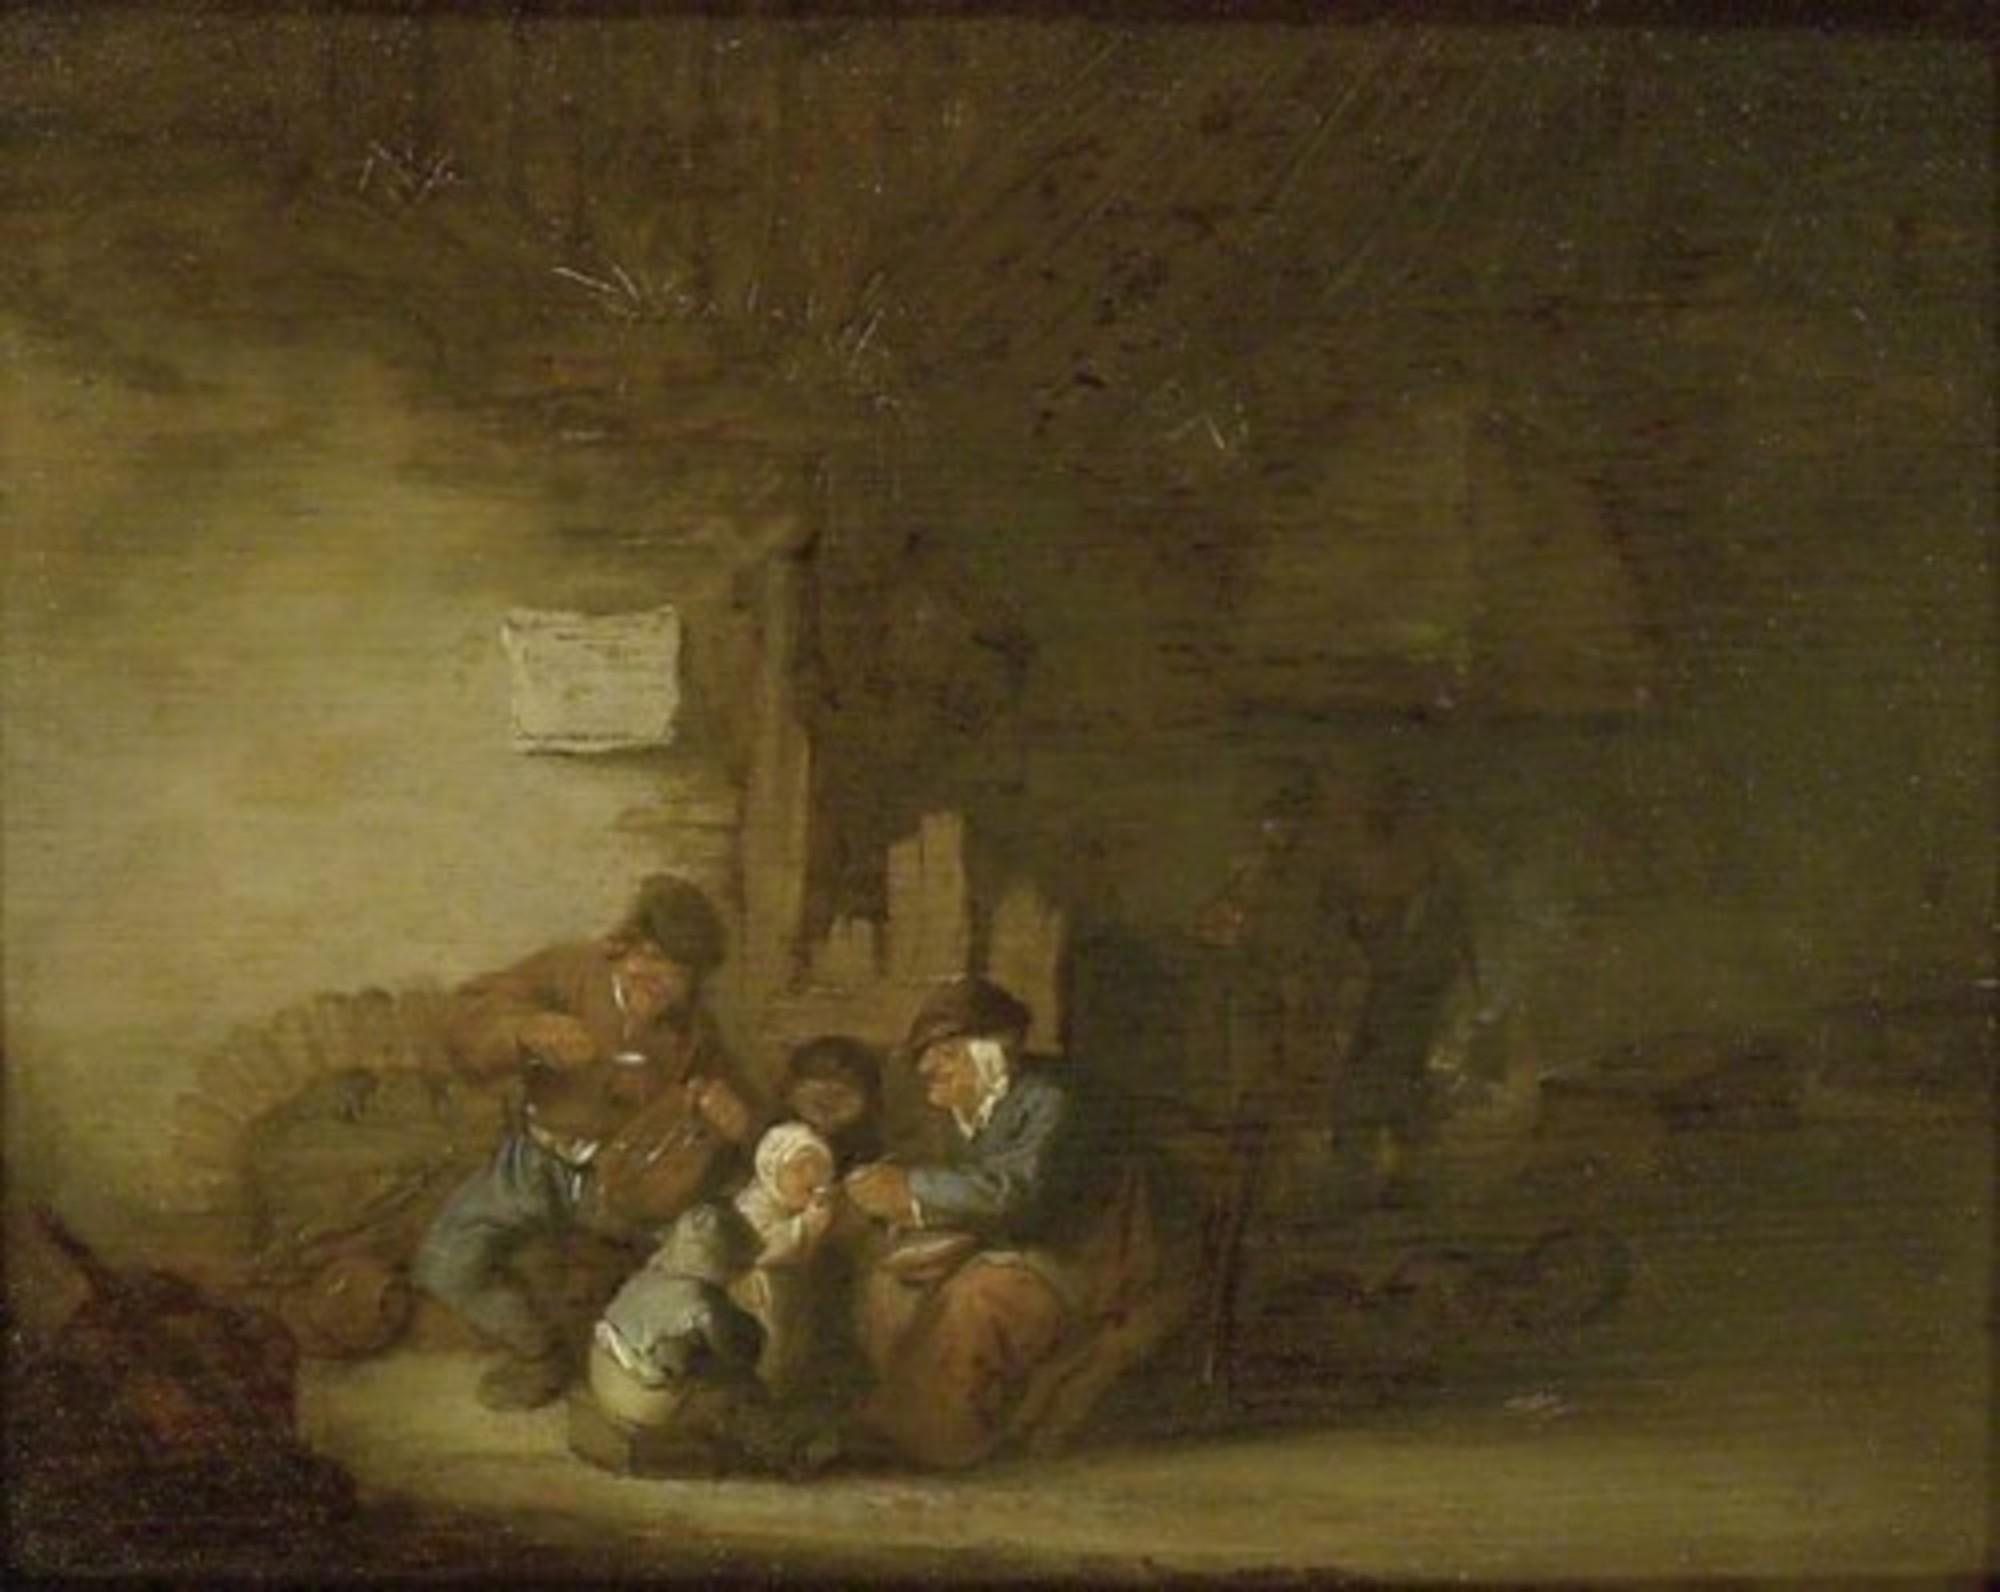 Adriaen-van-Ostade---A-Peasant-Family-eating-in-an-Interior-ASH-ASHM-WA1851-24.jpg